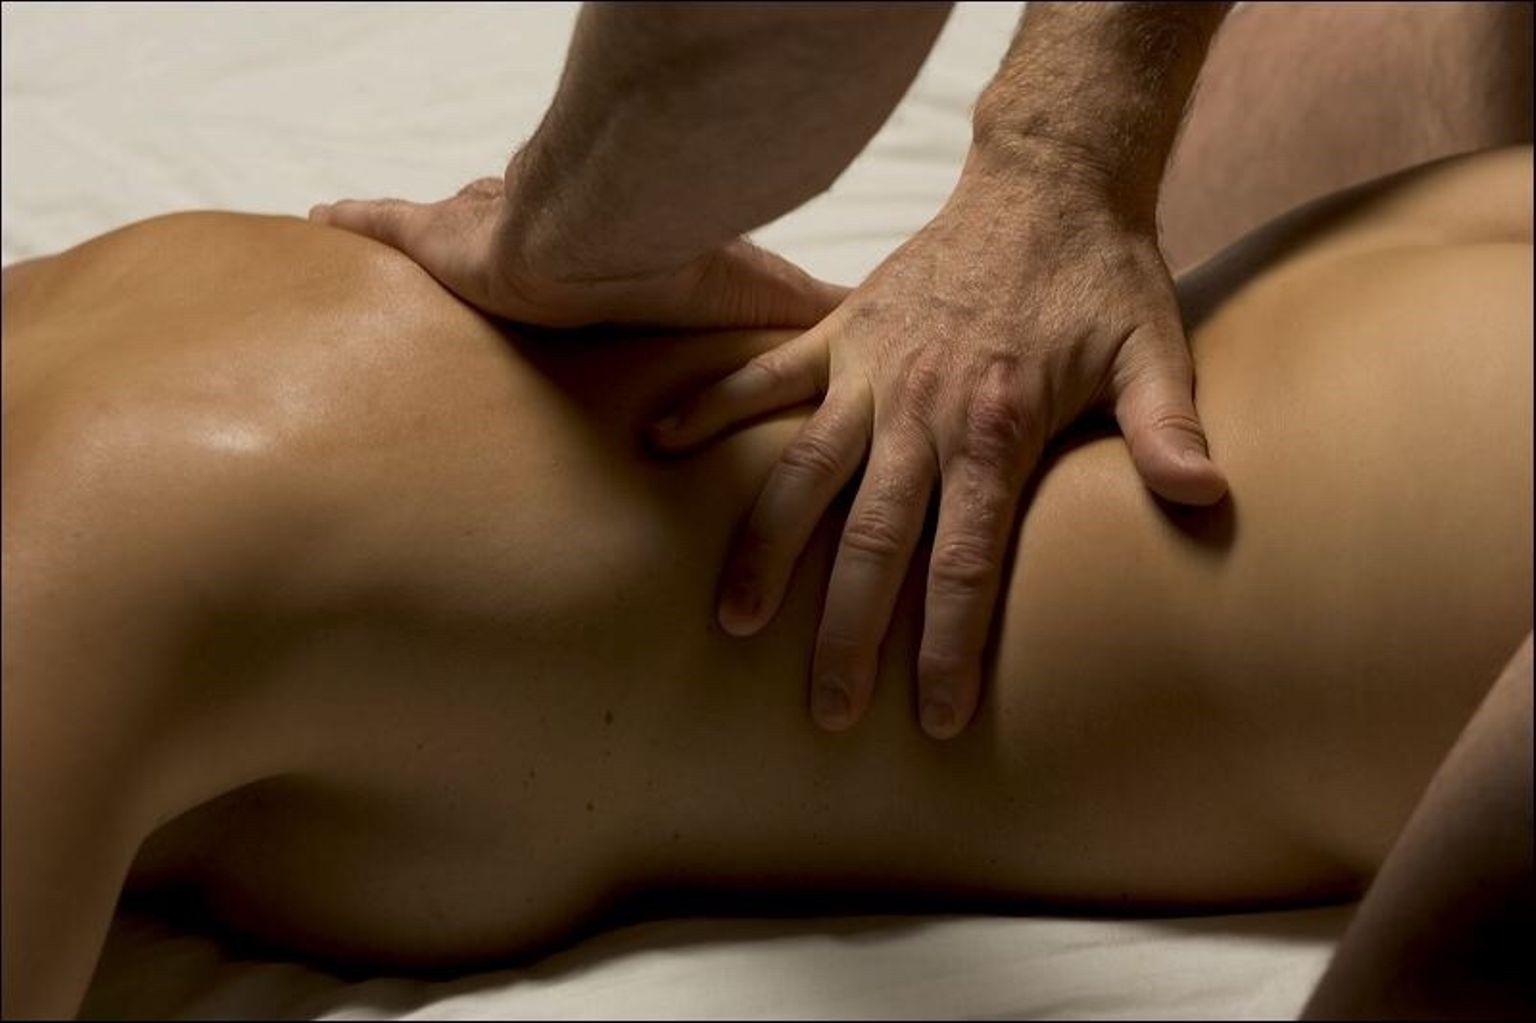 Техника тантрического массажа для мужчин и женщин